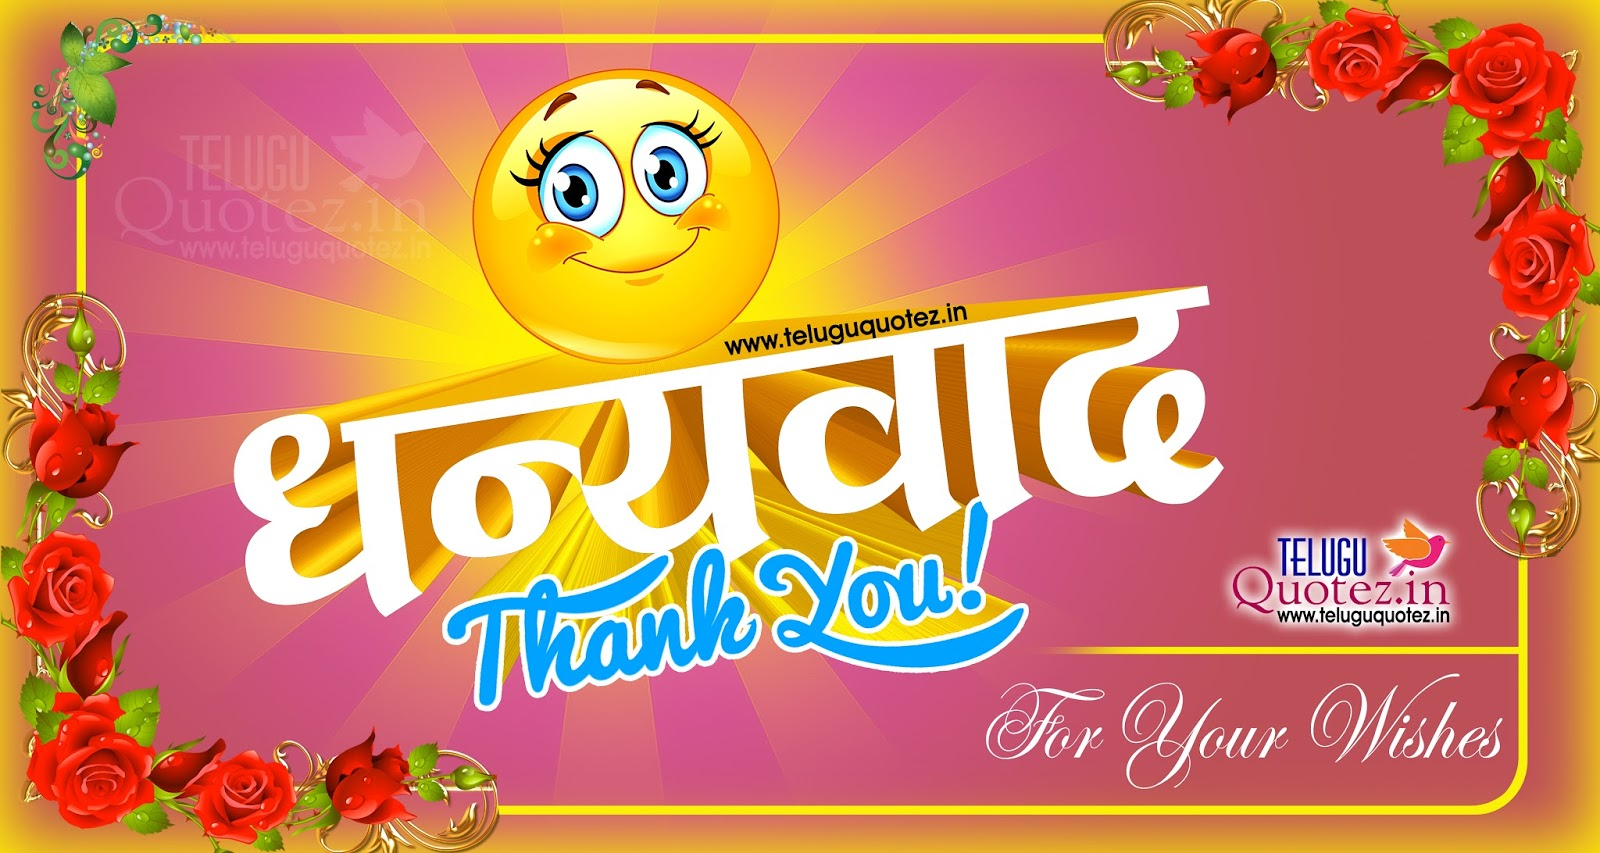 thank you hindi shayari quotes for birthday wishes | Teluguquotez.in ...